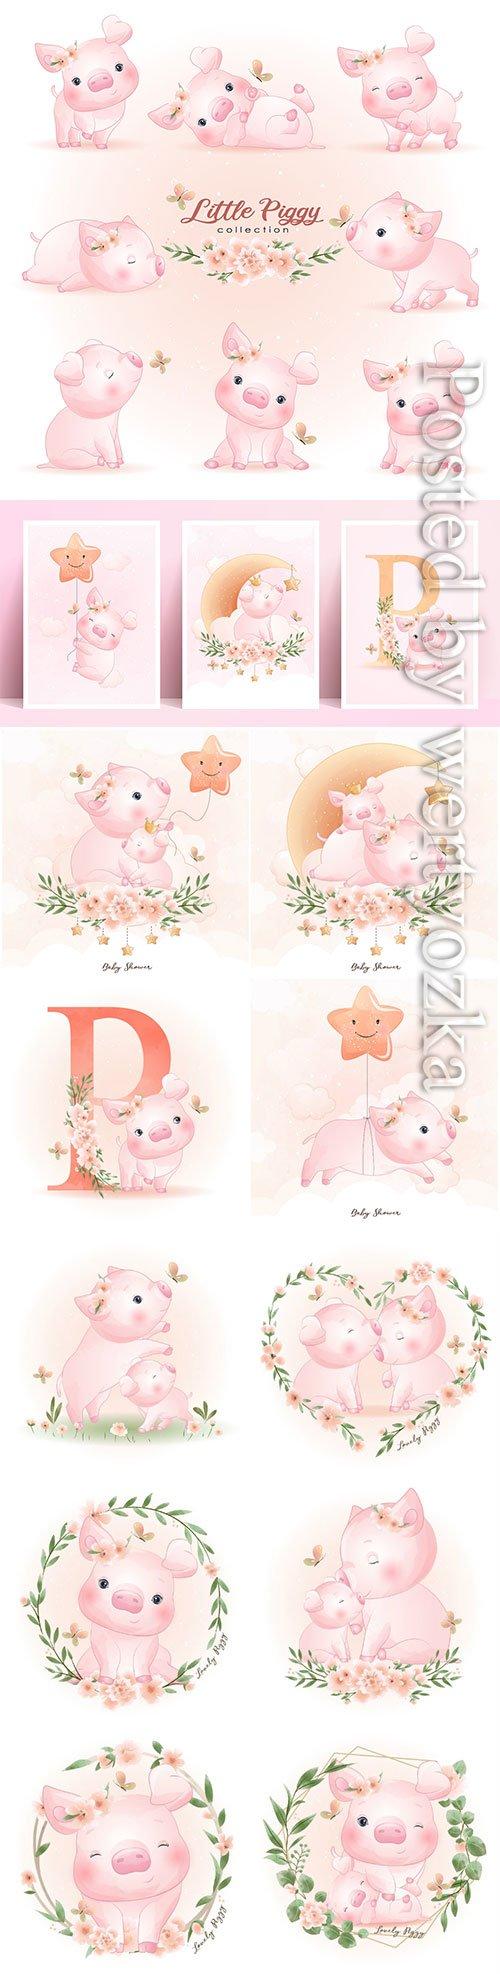 Cute doodle piggy poses with floral illustration premium vector